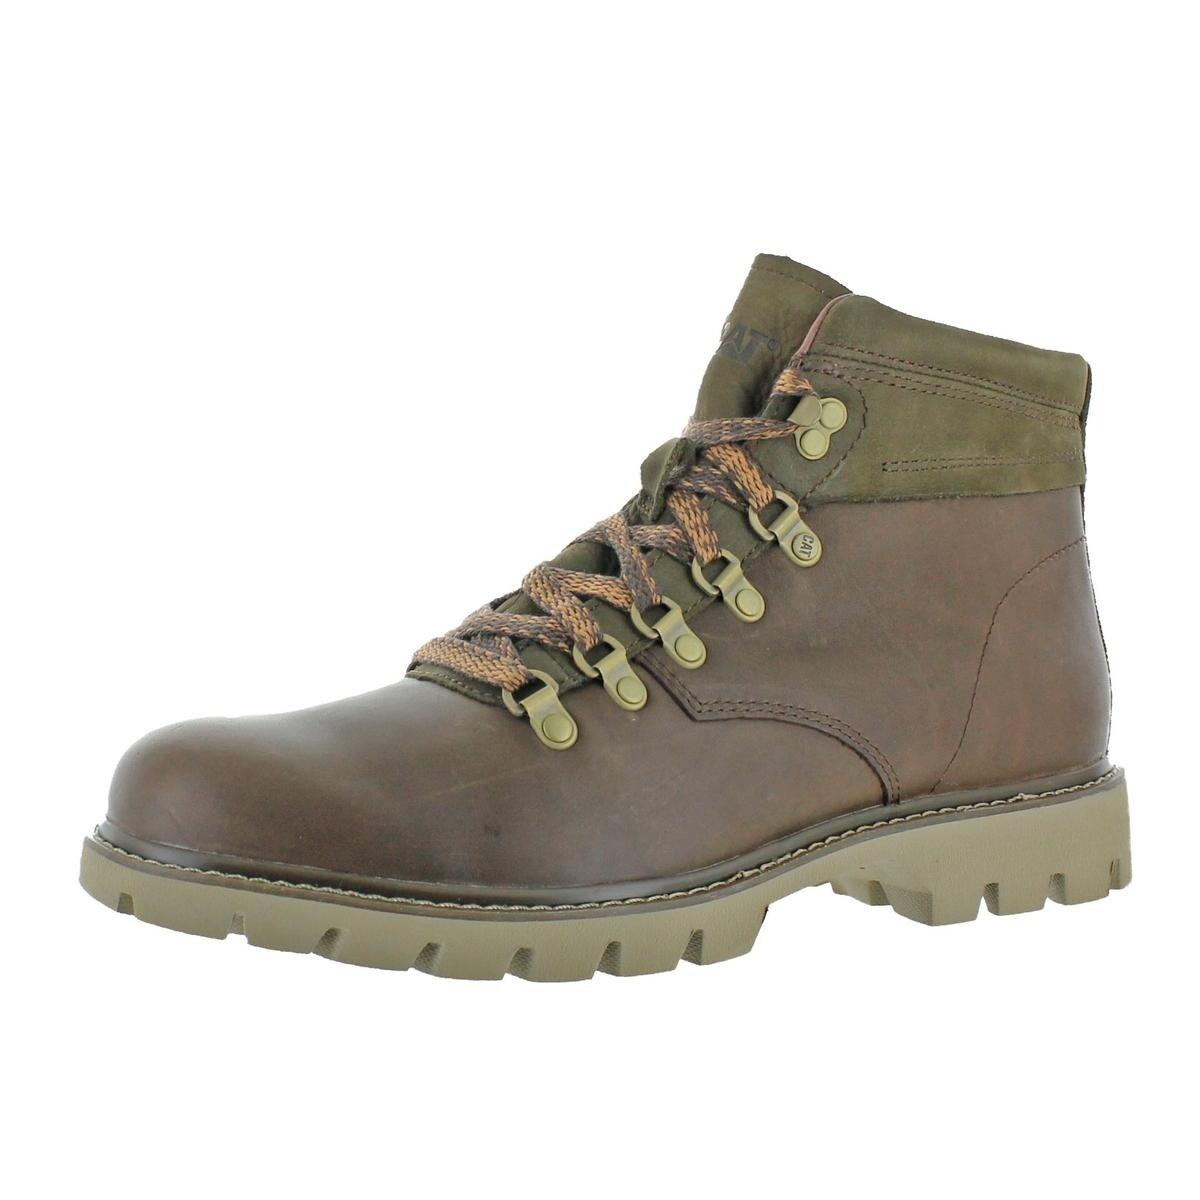 Caterpillar Mens Crux Hiking Boots Flex